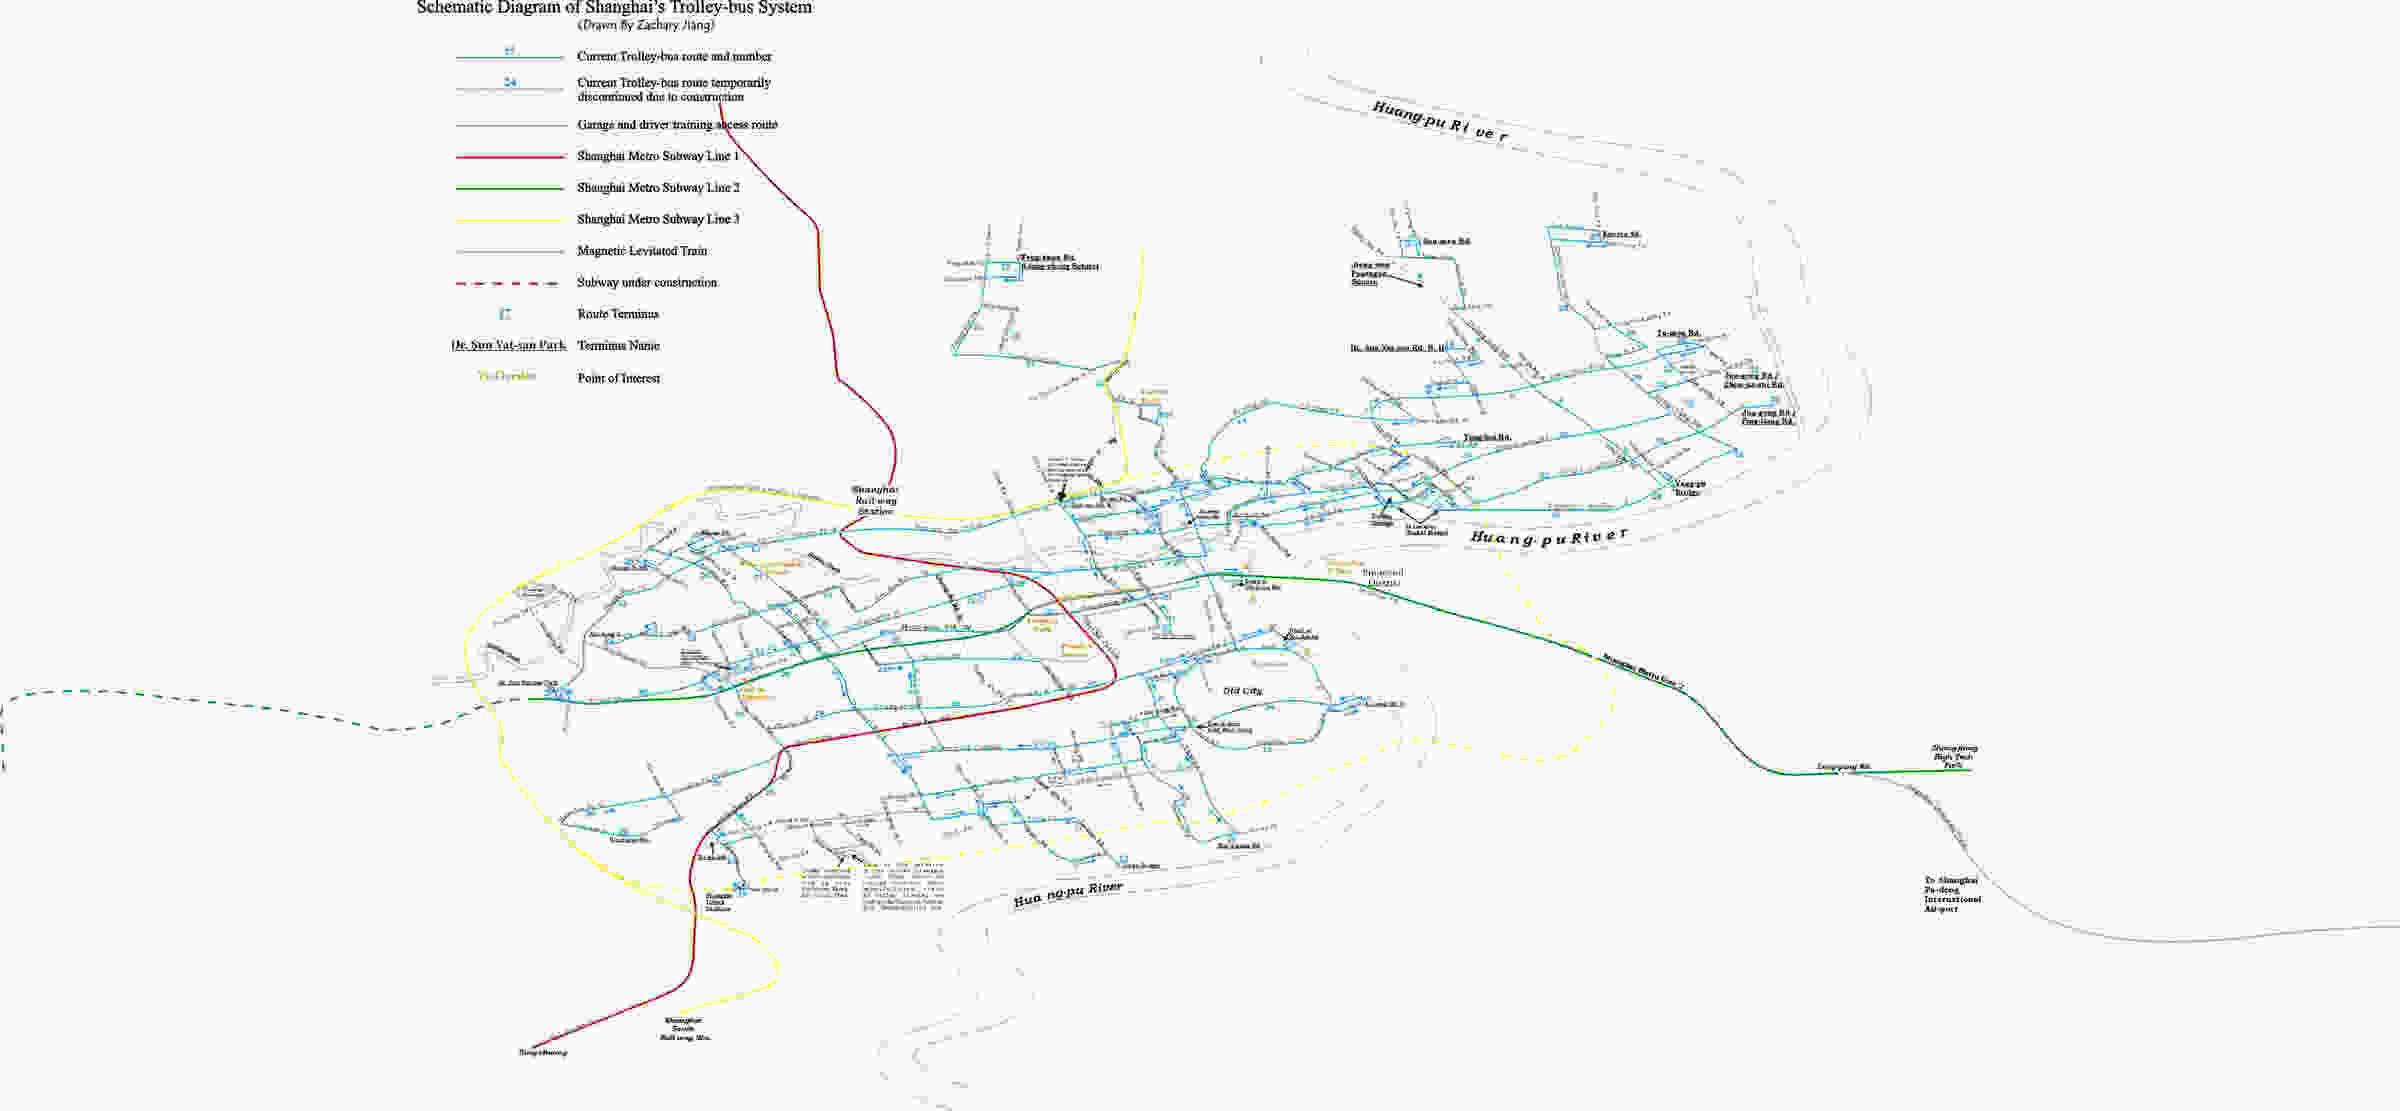 Schematic diagram of Shanghai\'s trolley-bus system | Virtual Shanghai